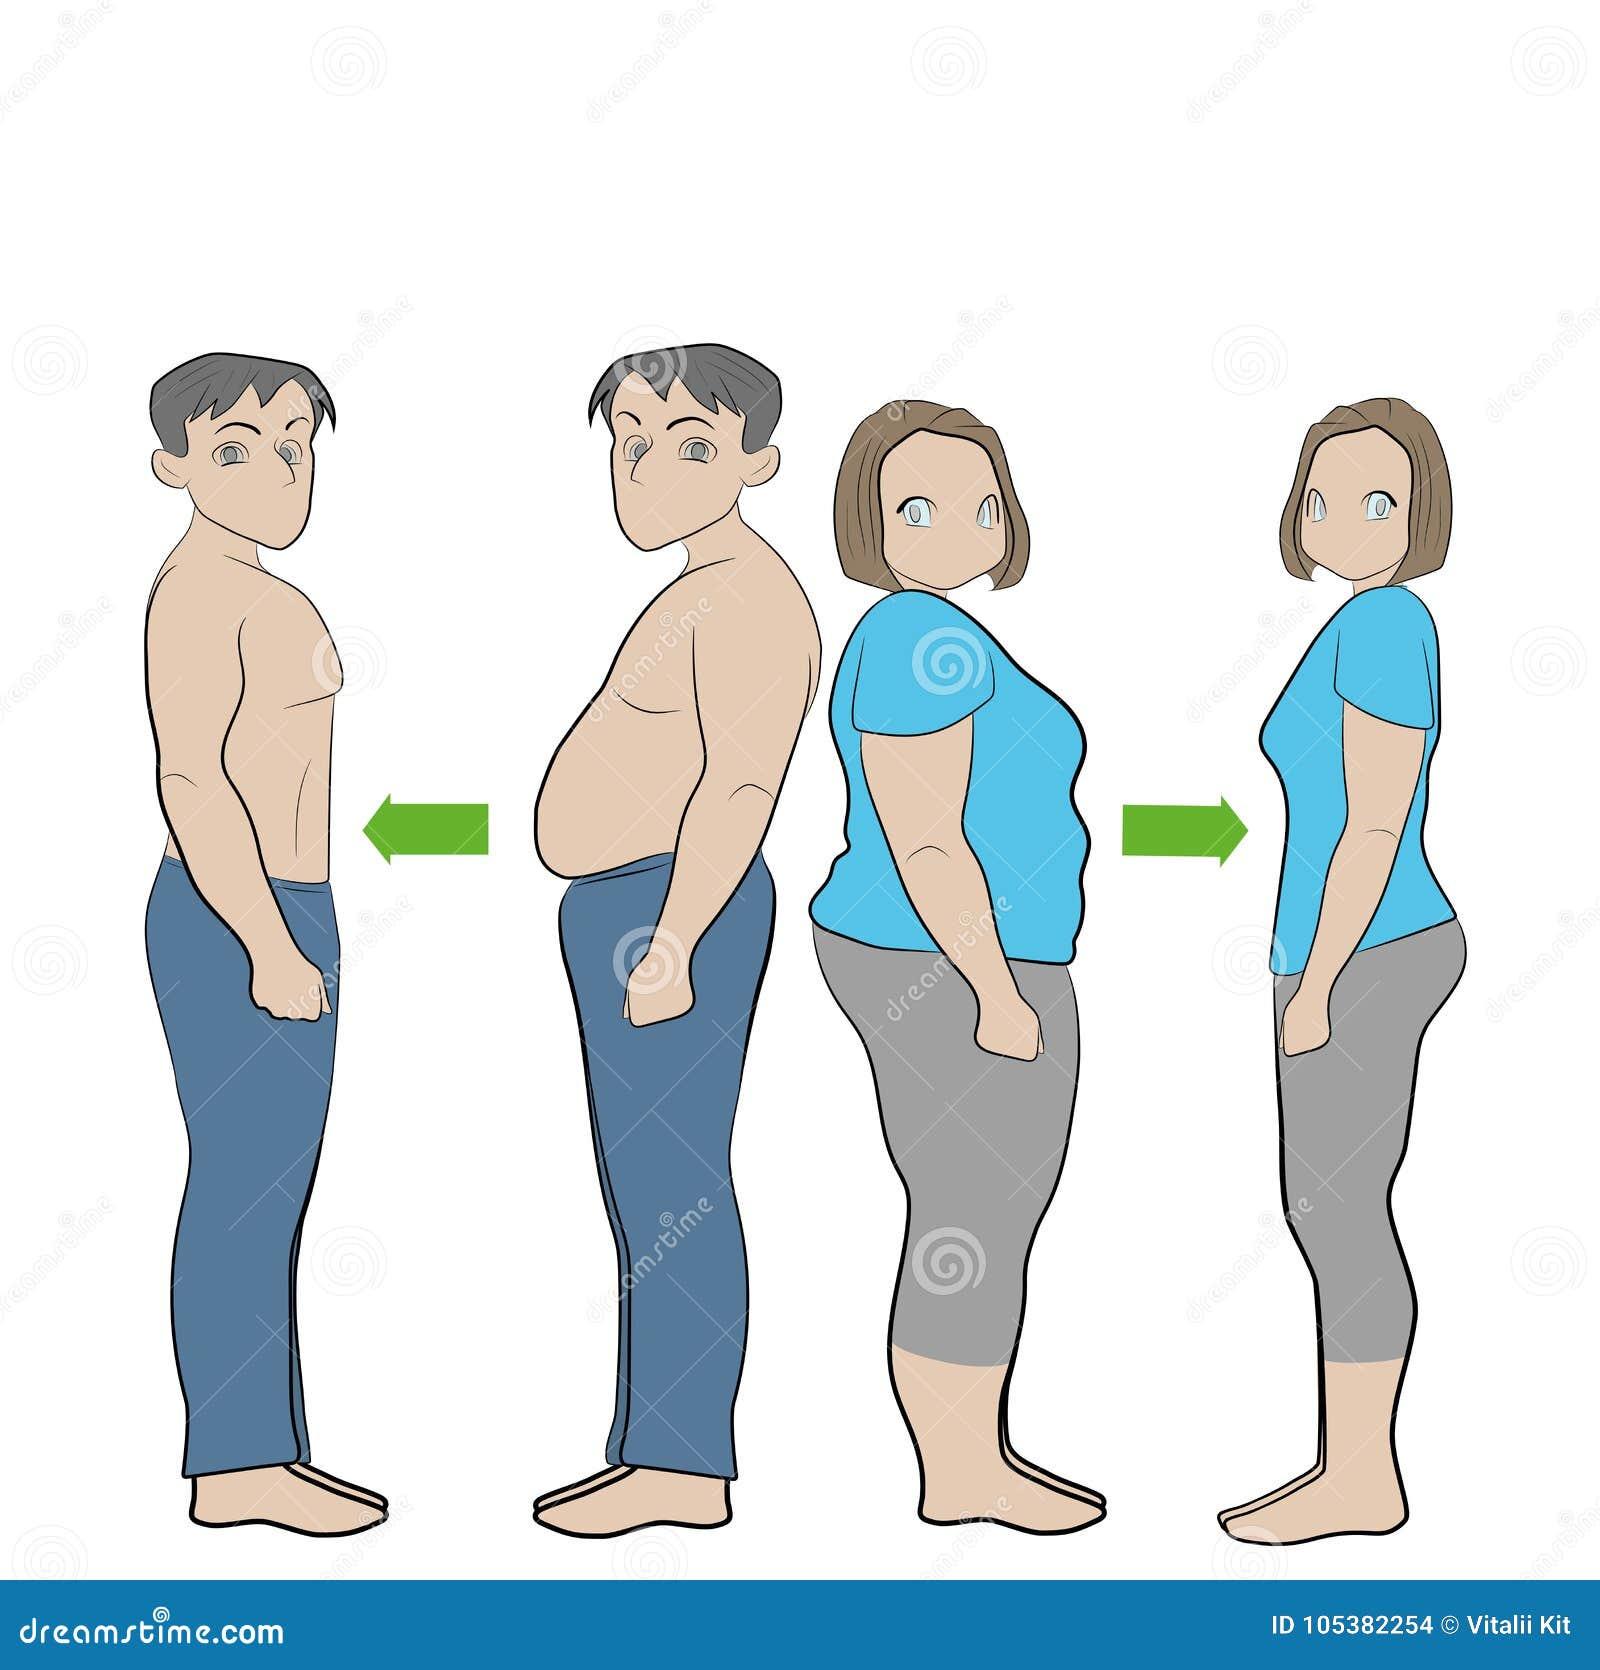 dieta a forma di corpo a forma di pera